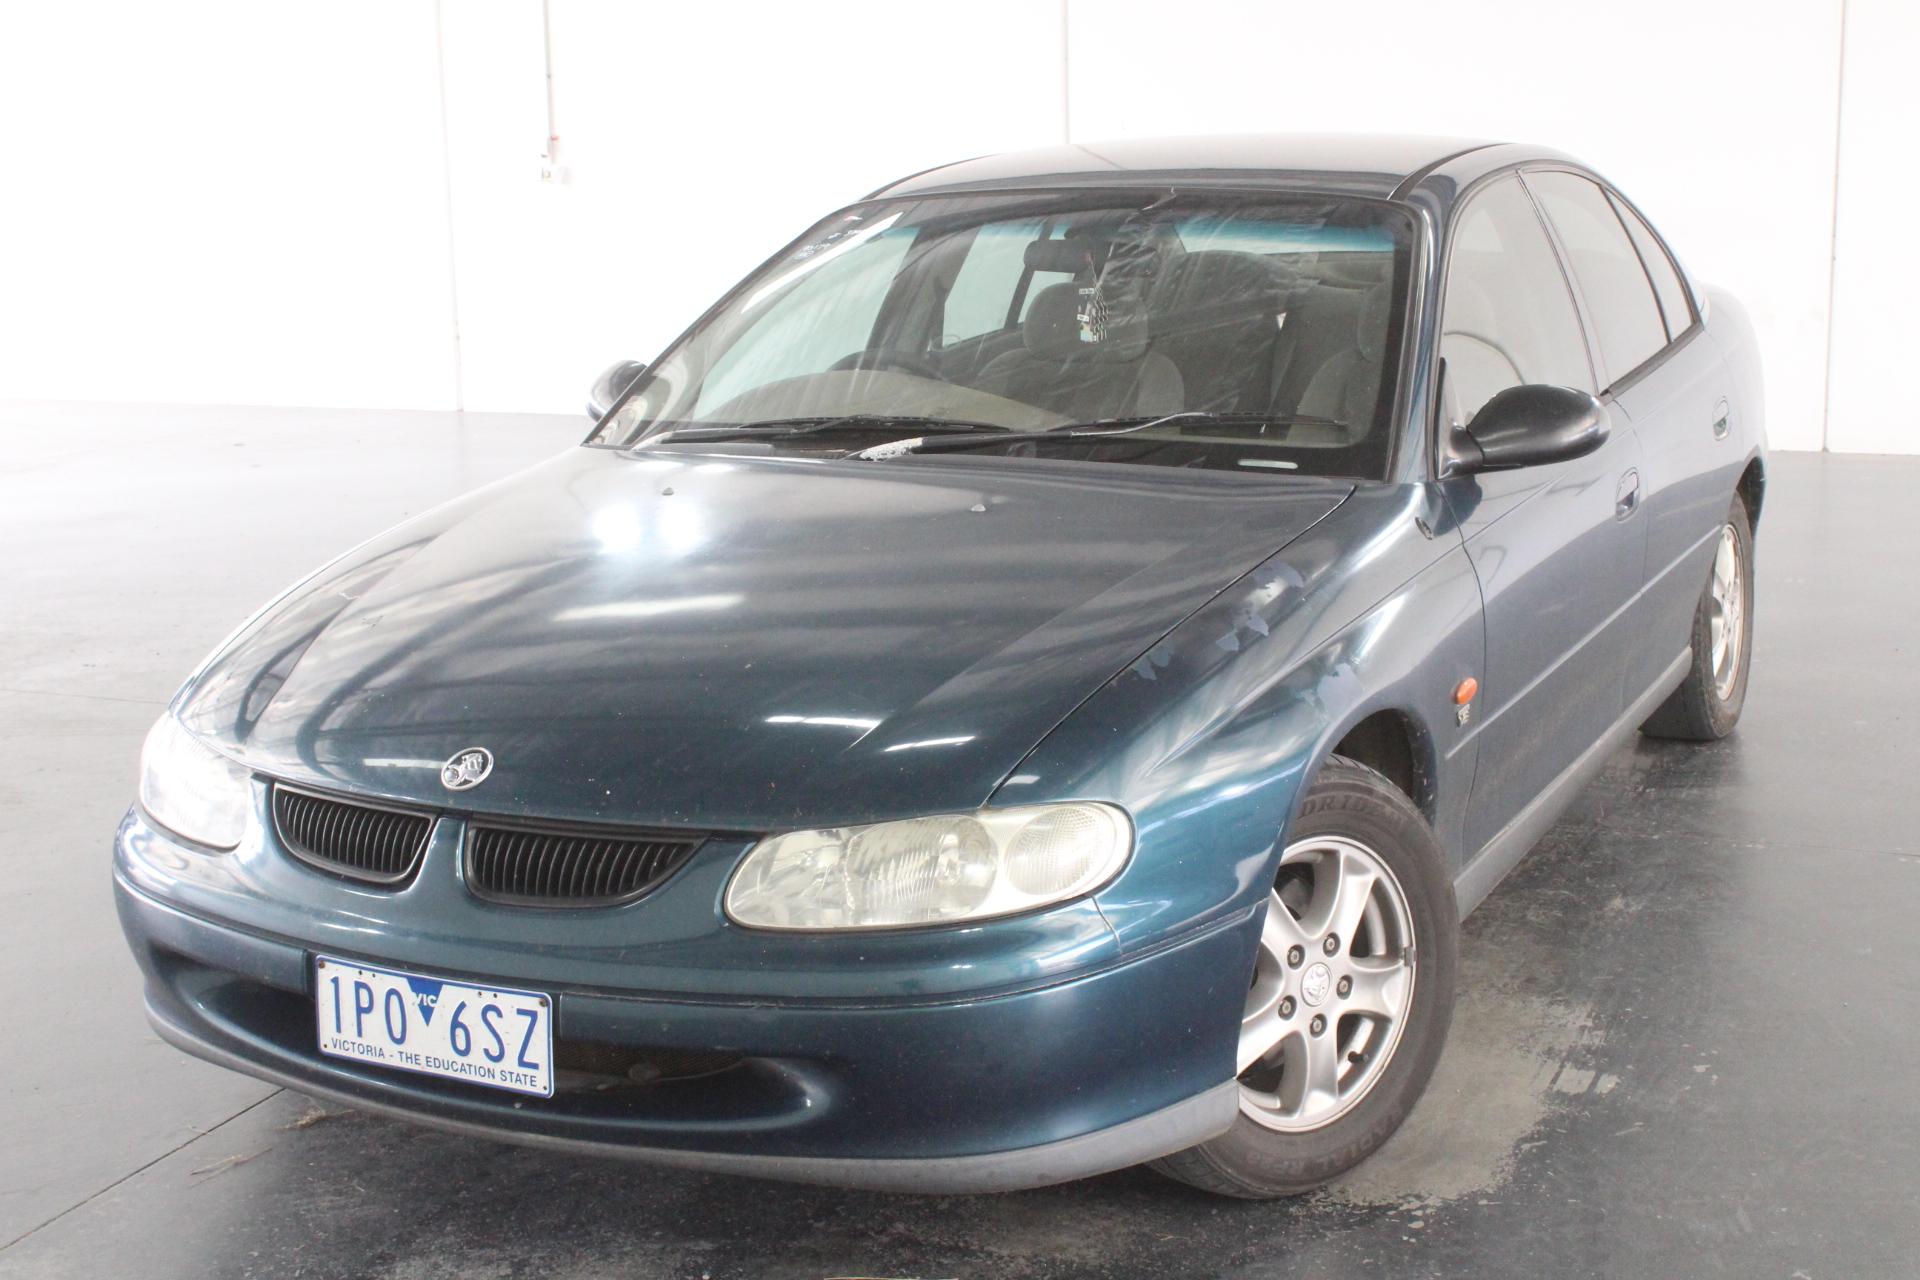 1997 Holden Commodore Executive VT Automatic Sedan